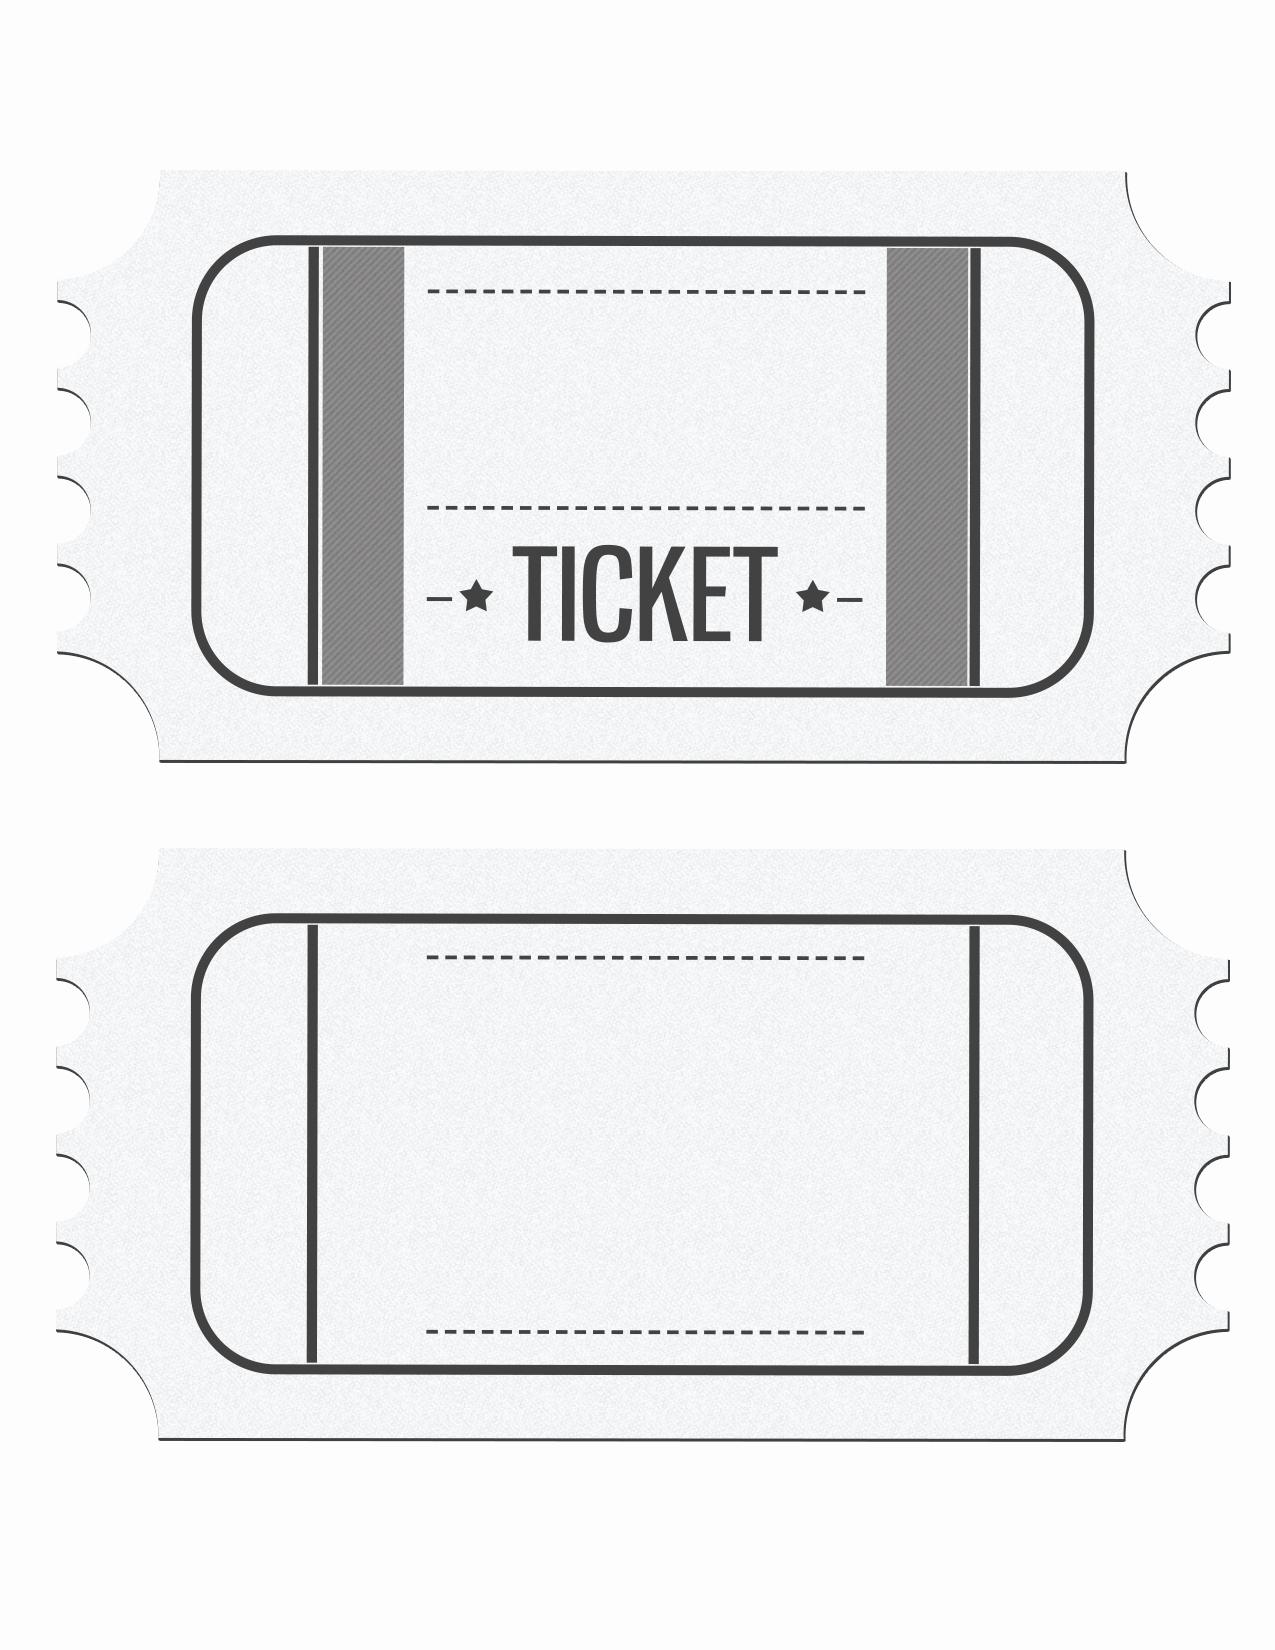 Admission Ticket Invitation Template Free New Blank Movie Ticket Invitation Template